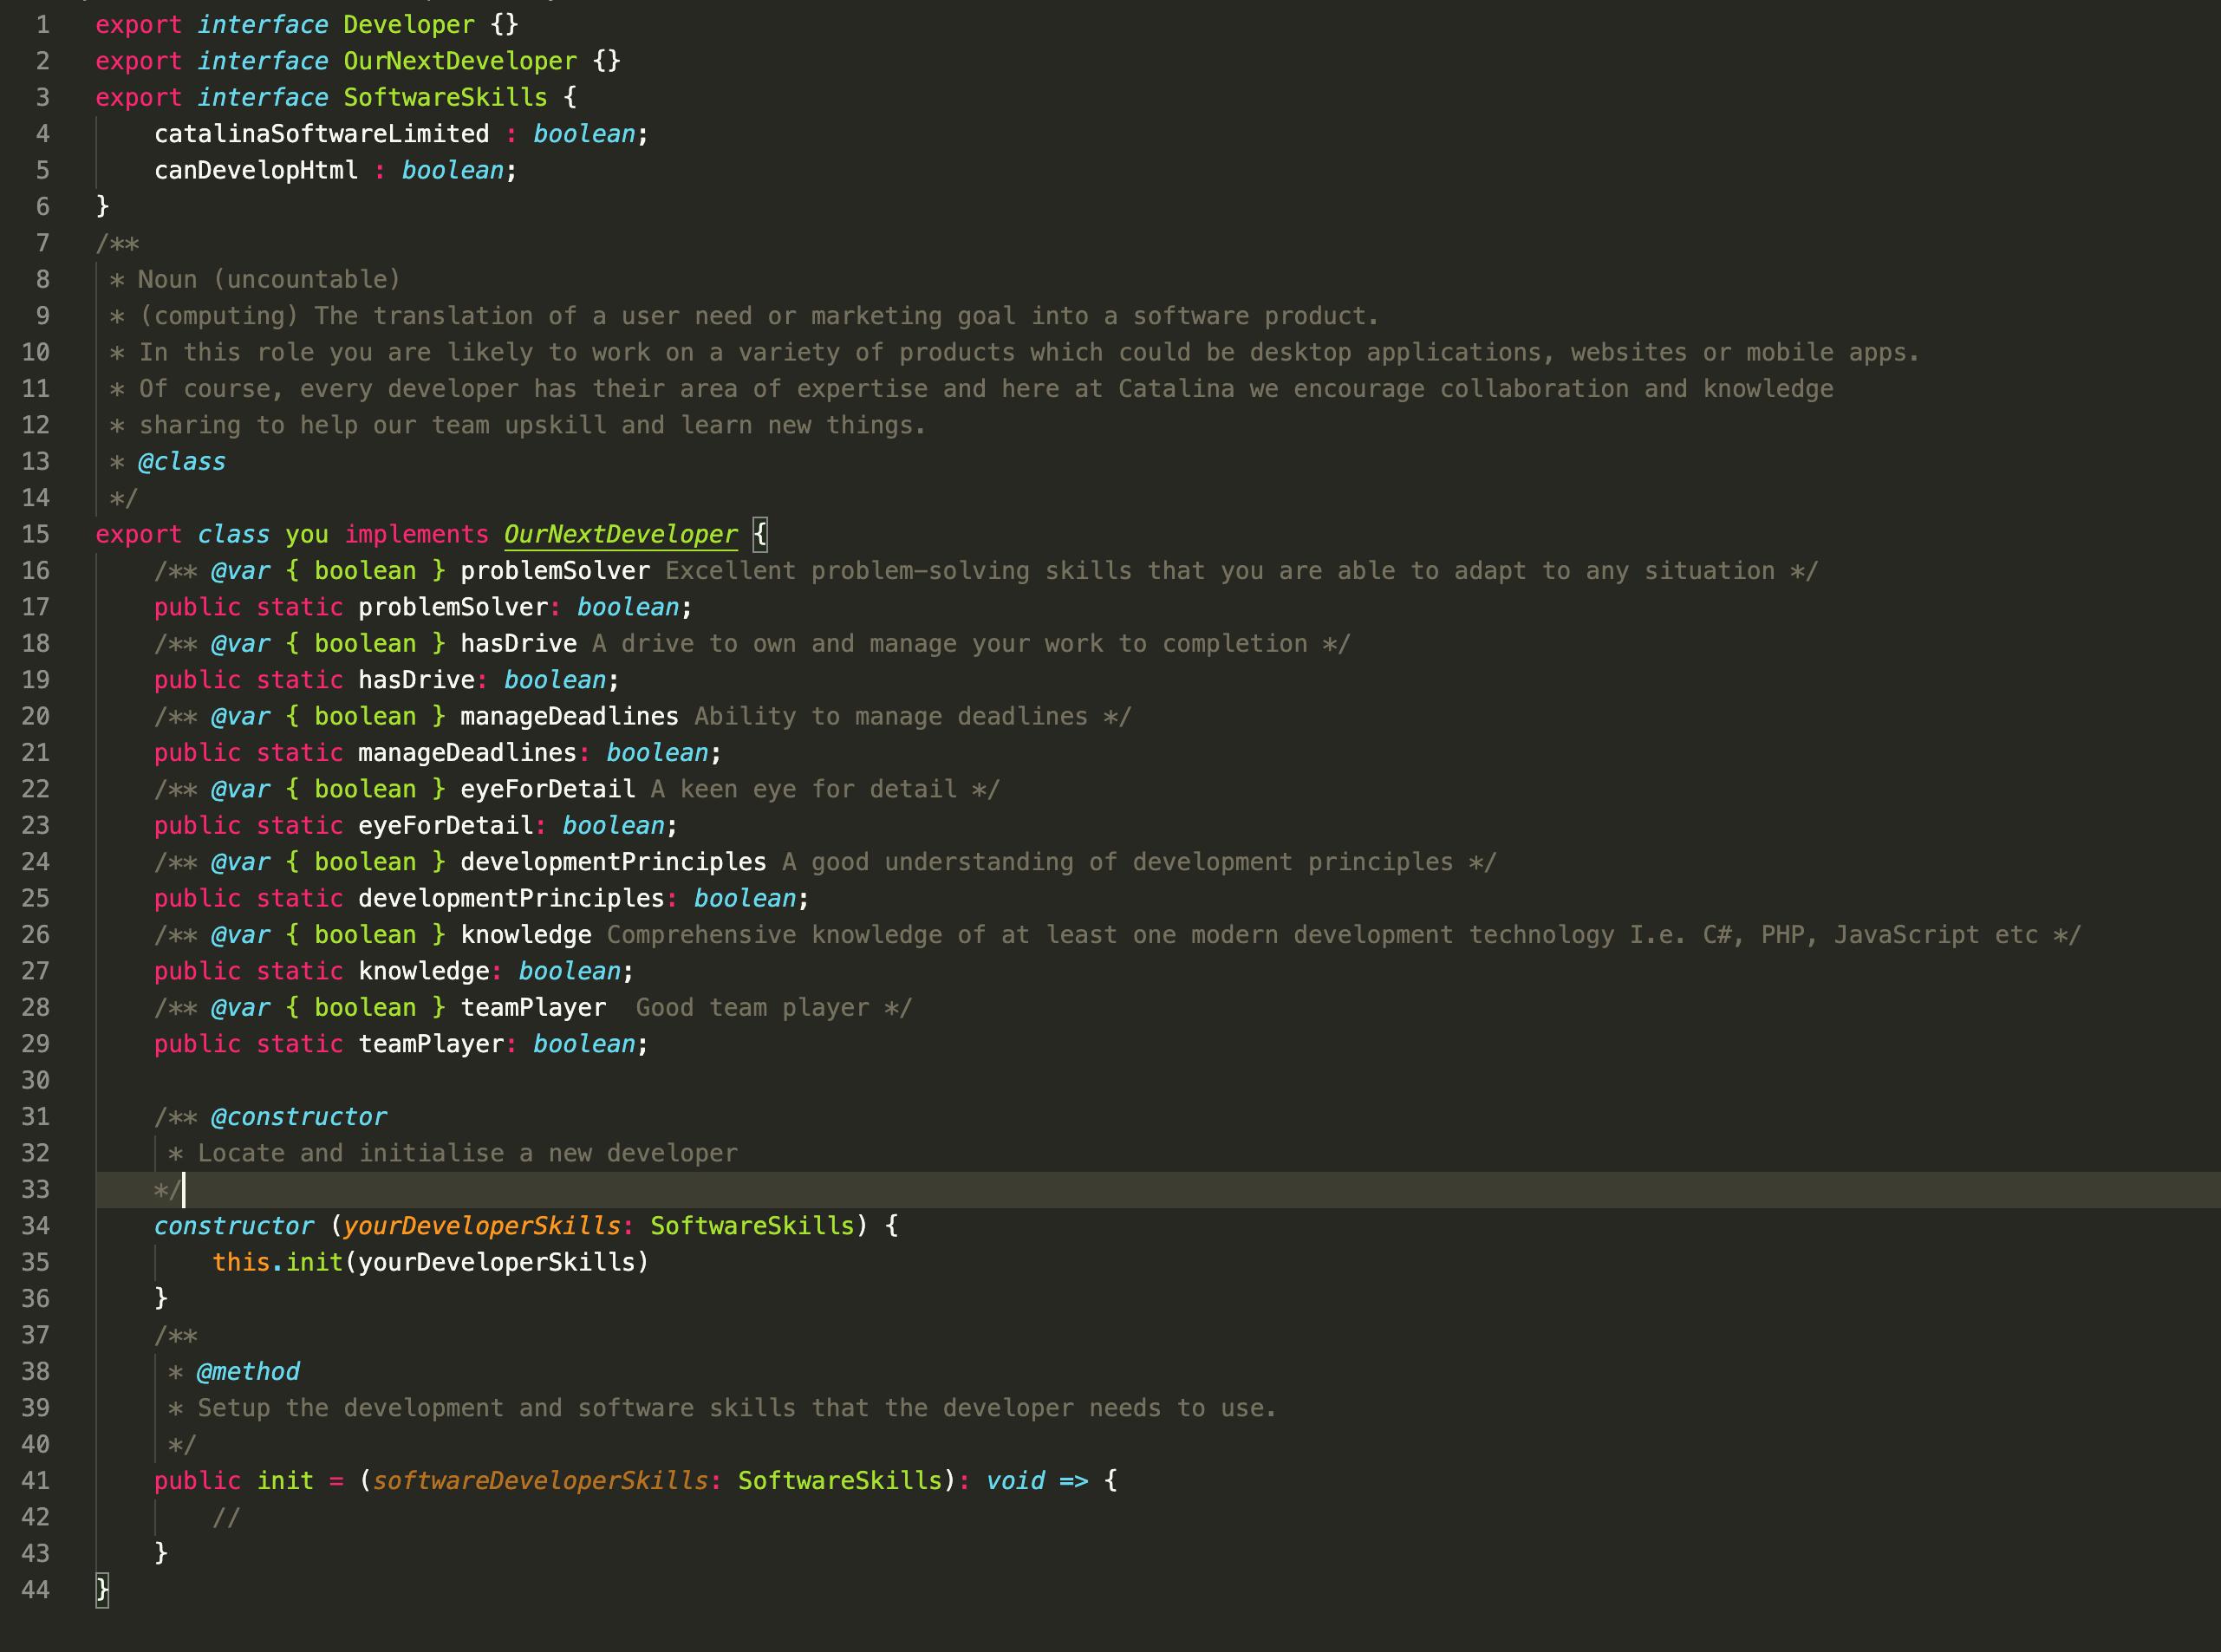 Job ad in code